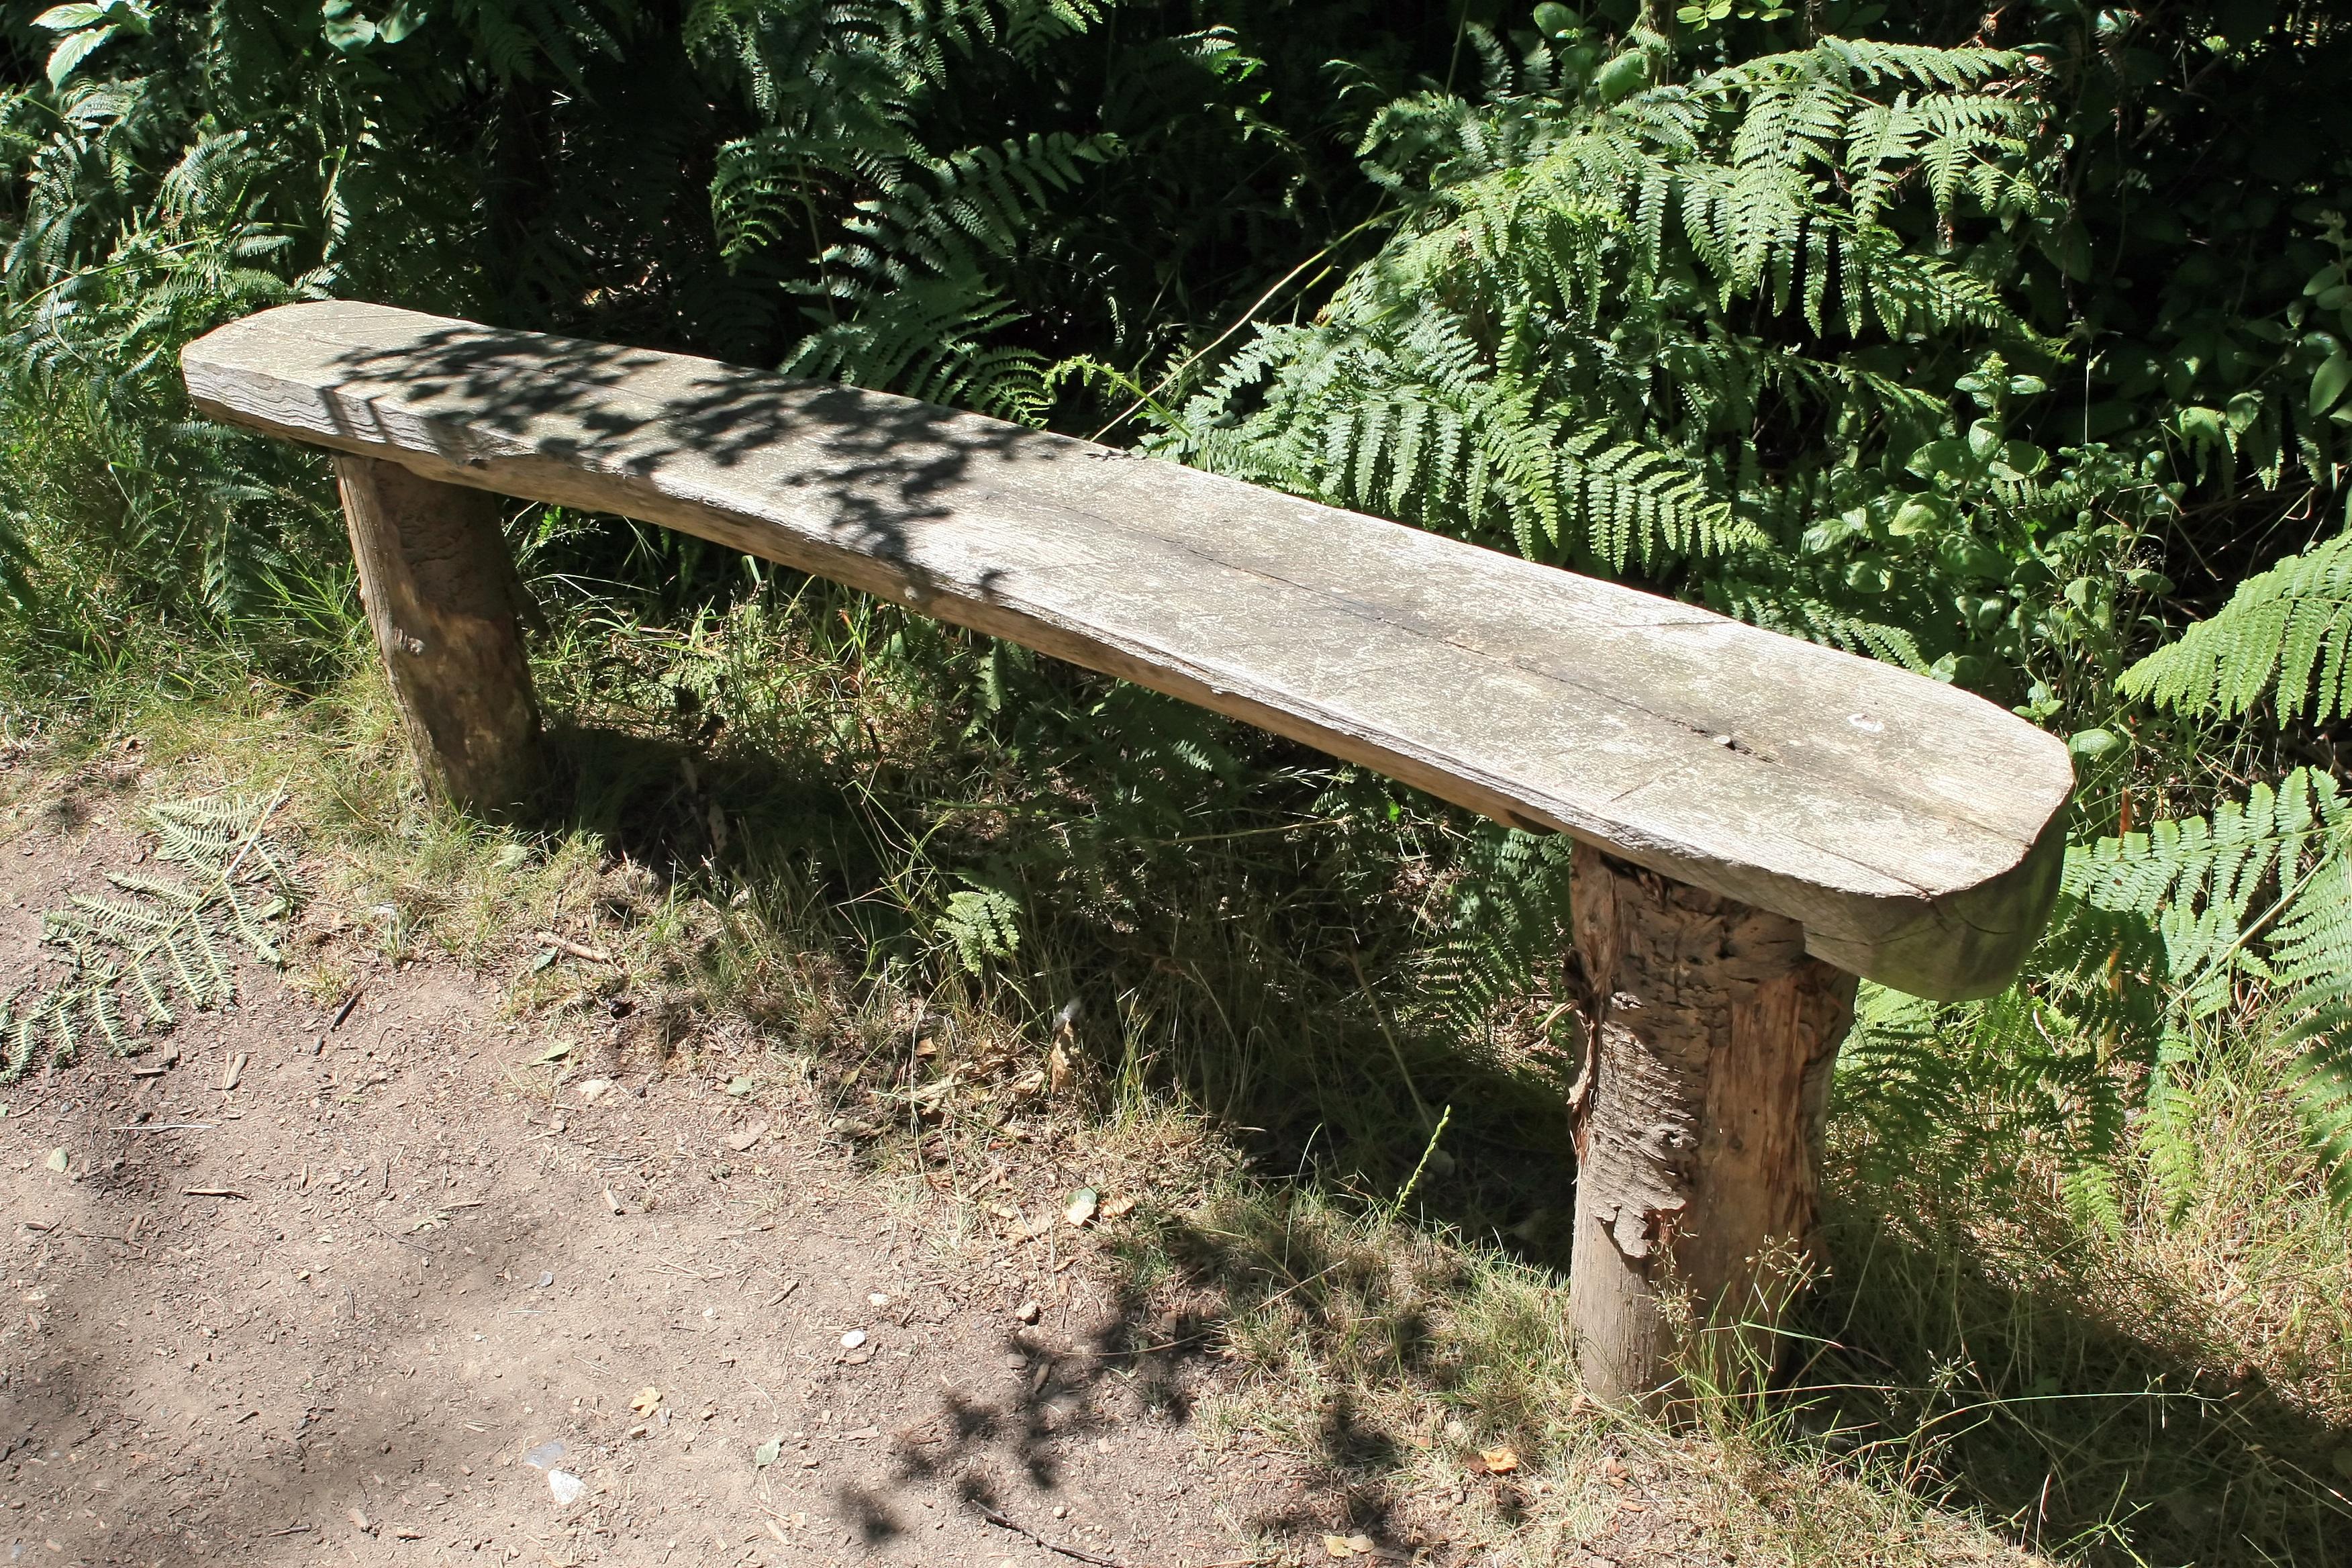 Fotos gratis : mesa, árbol, bosque, camino, pista, sendero, banco ...